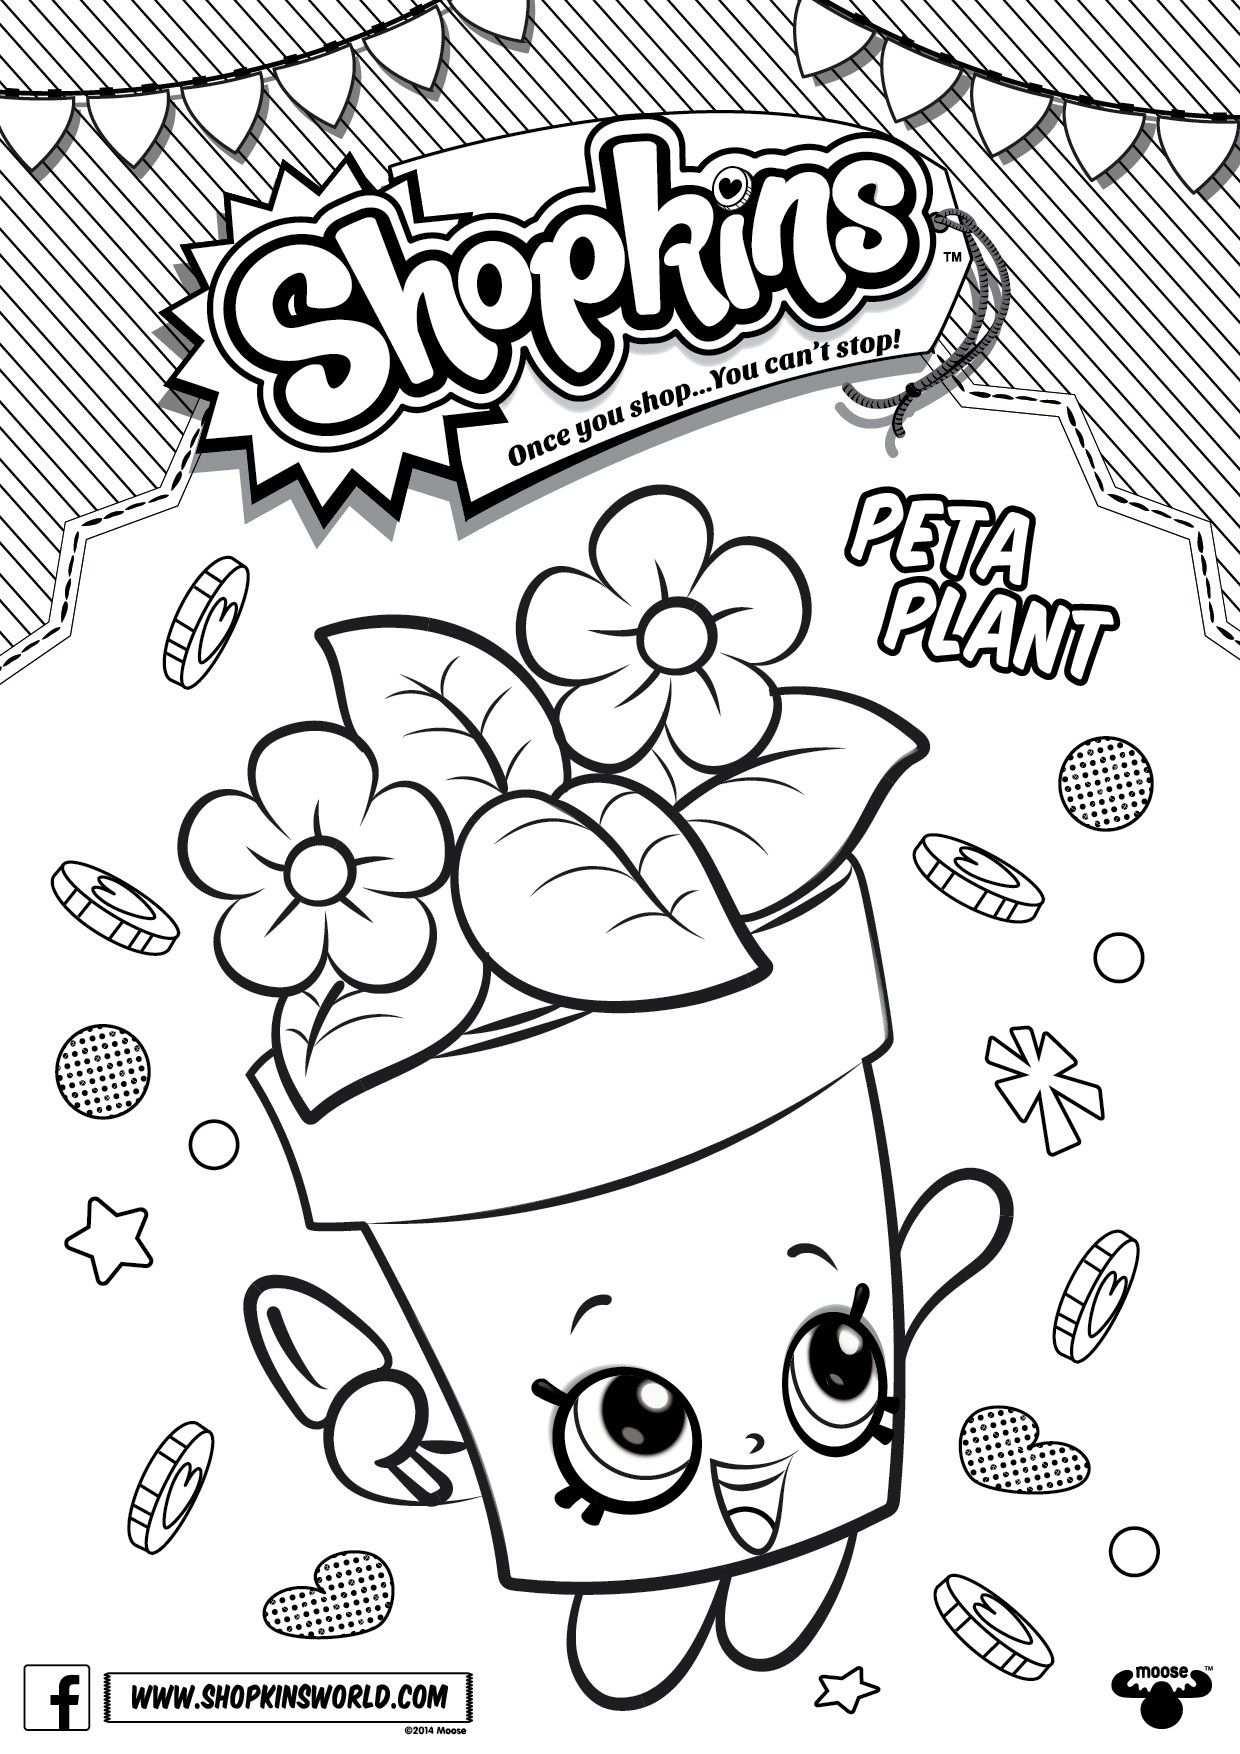 Shopkins Coloring Pages Season 4 Peta Plant Kleurplaten